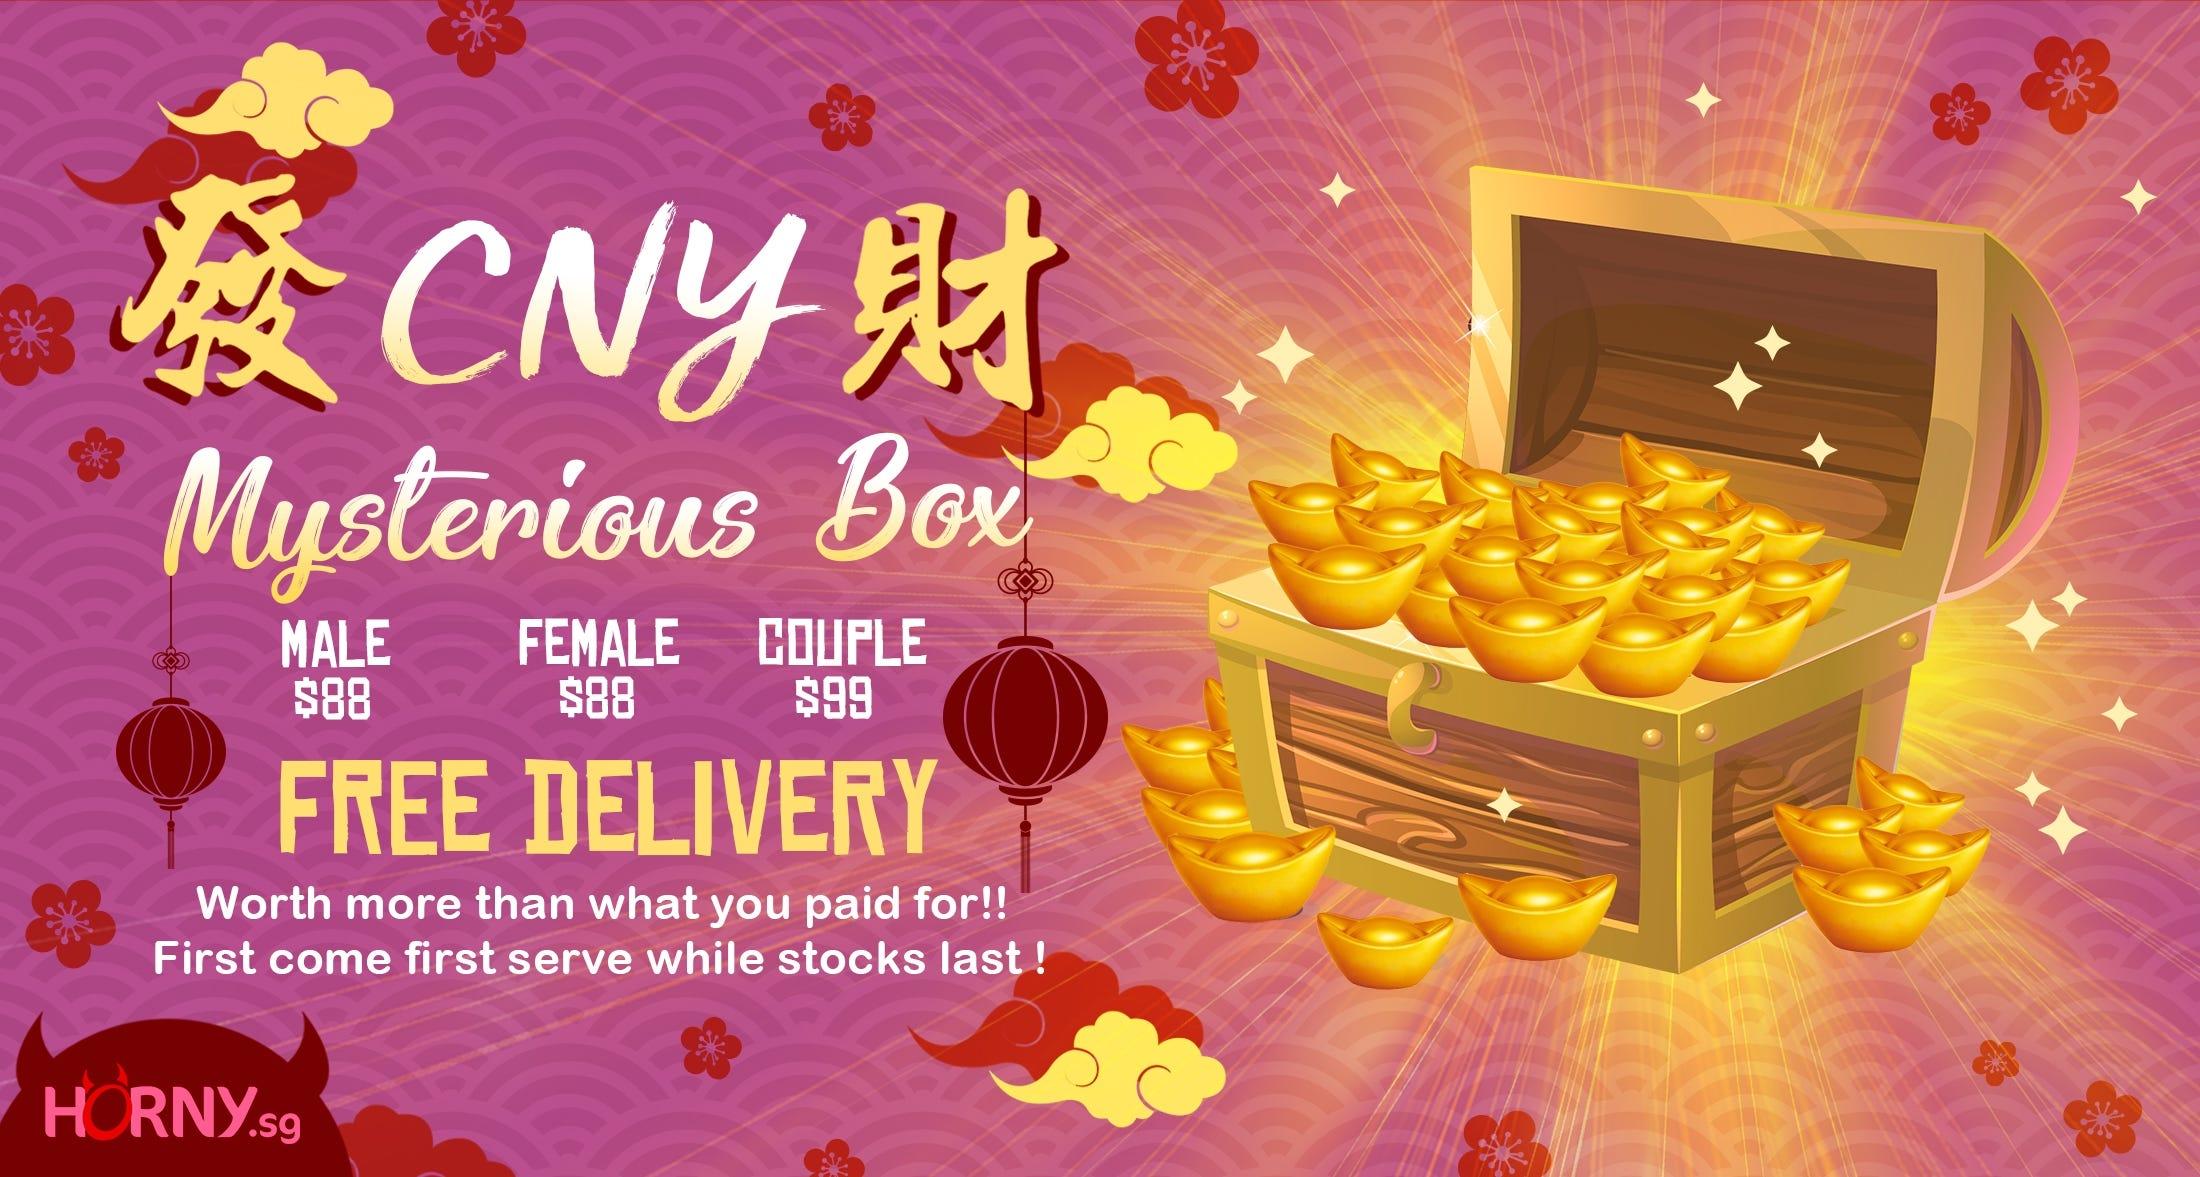 CNY box